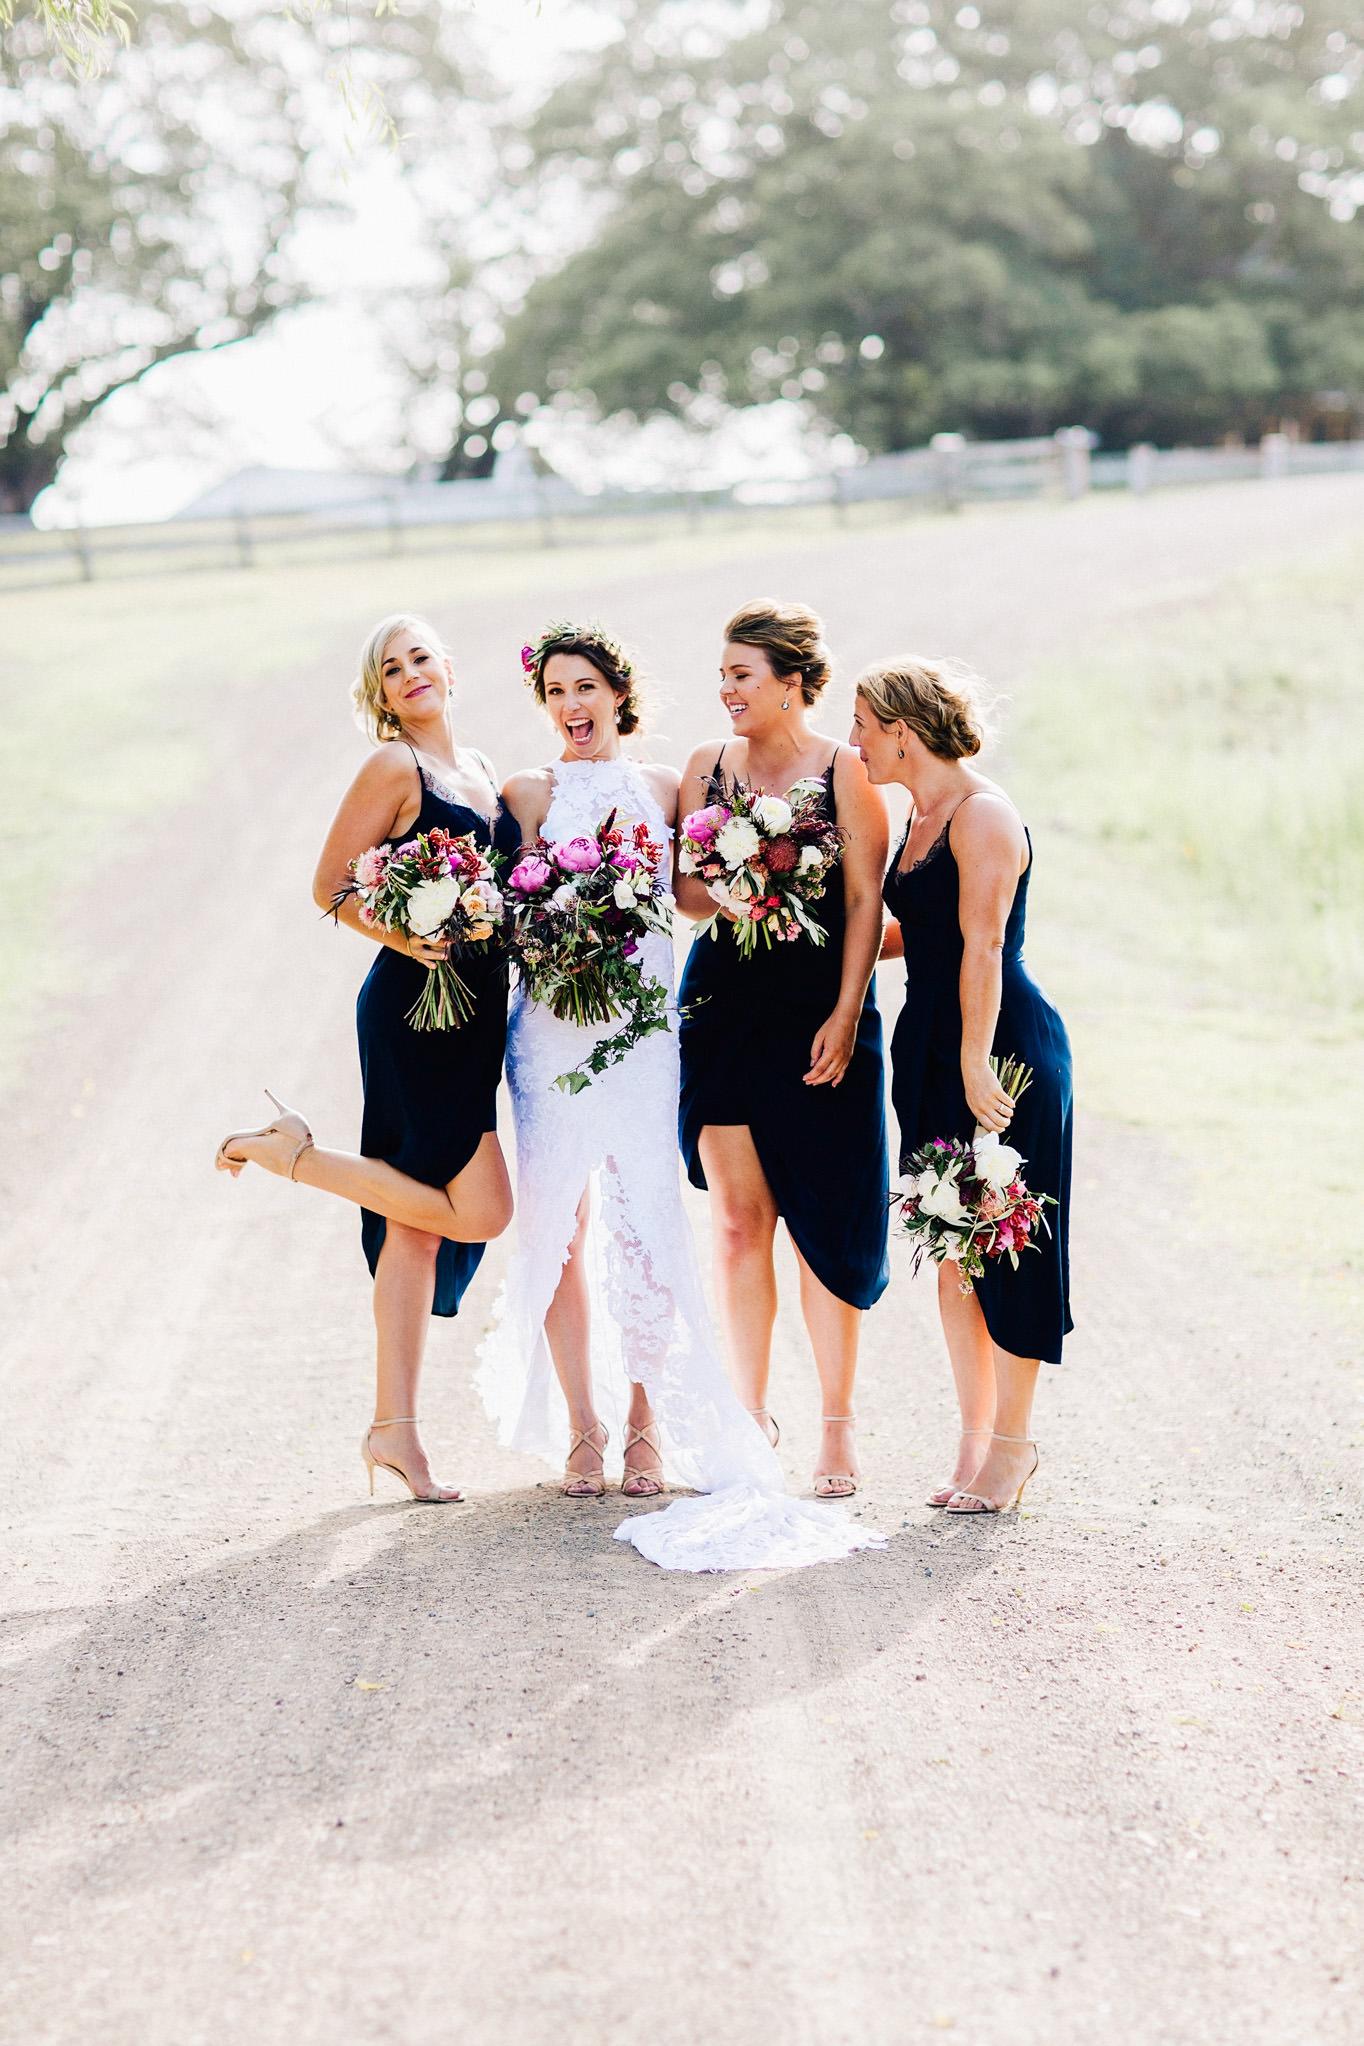 TocalHomestead_WeddingPhotography_LaurenAnnePhotography-1087.jpg